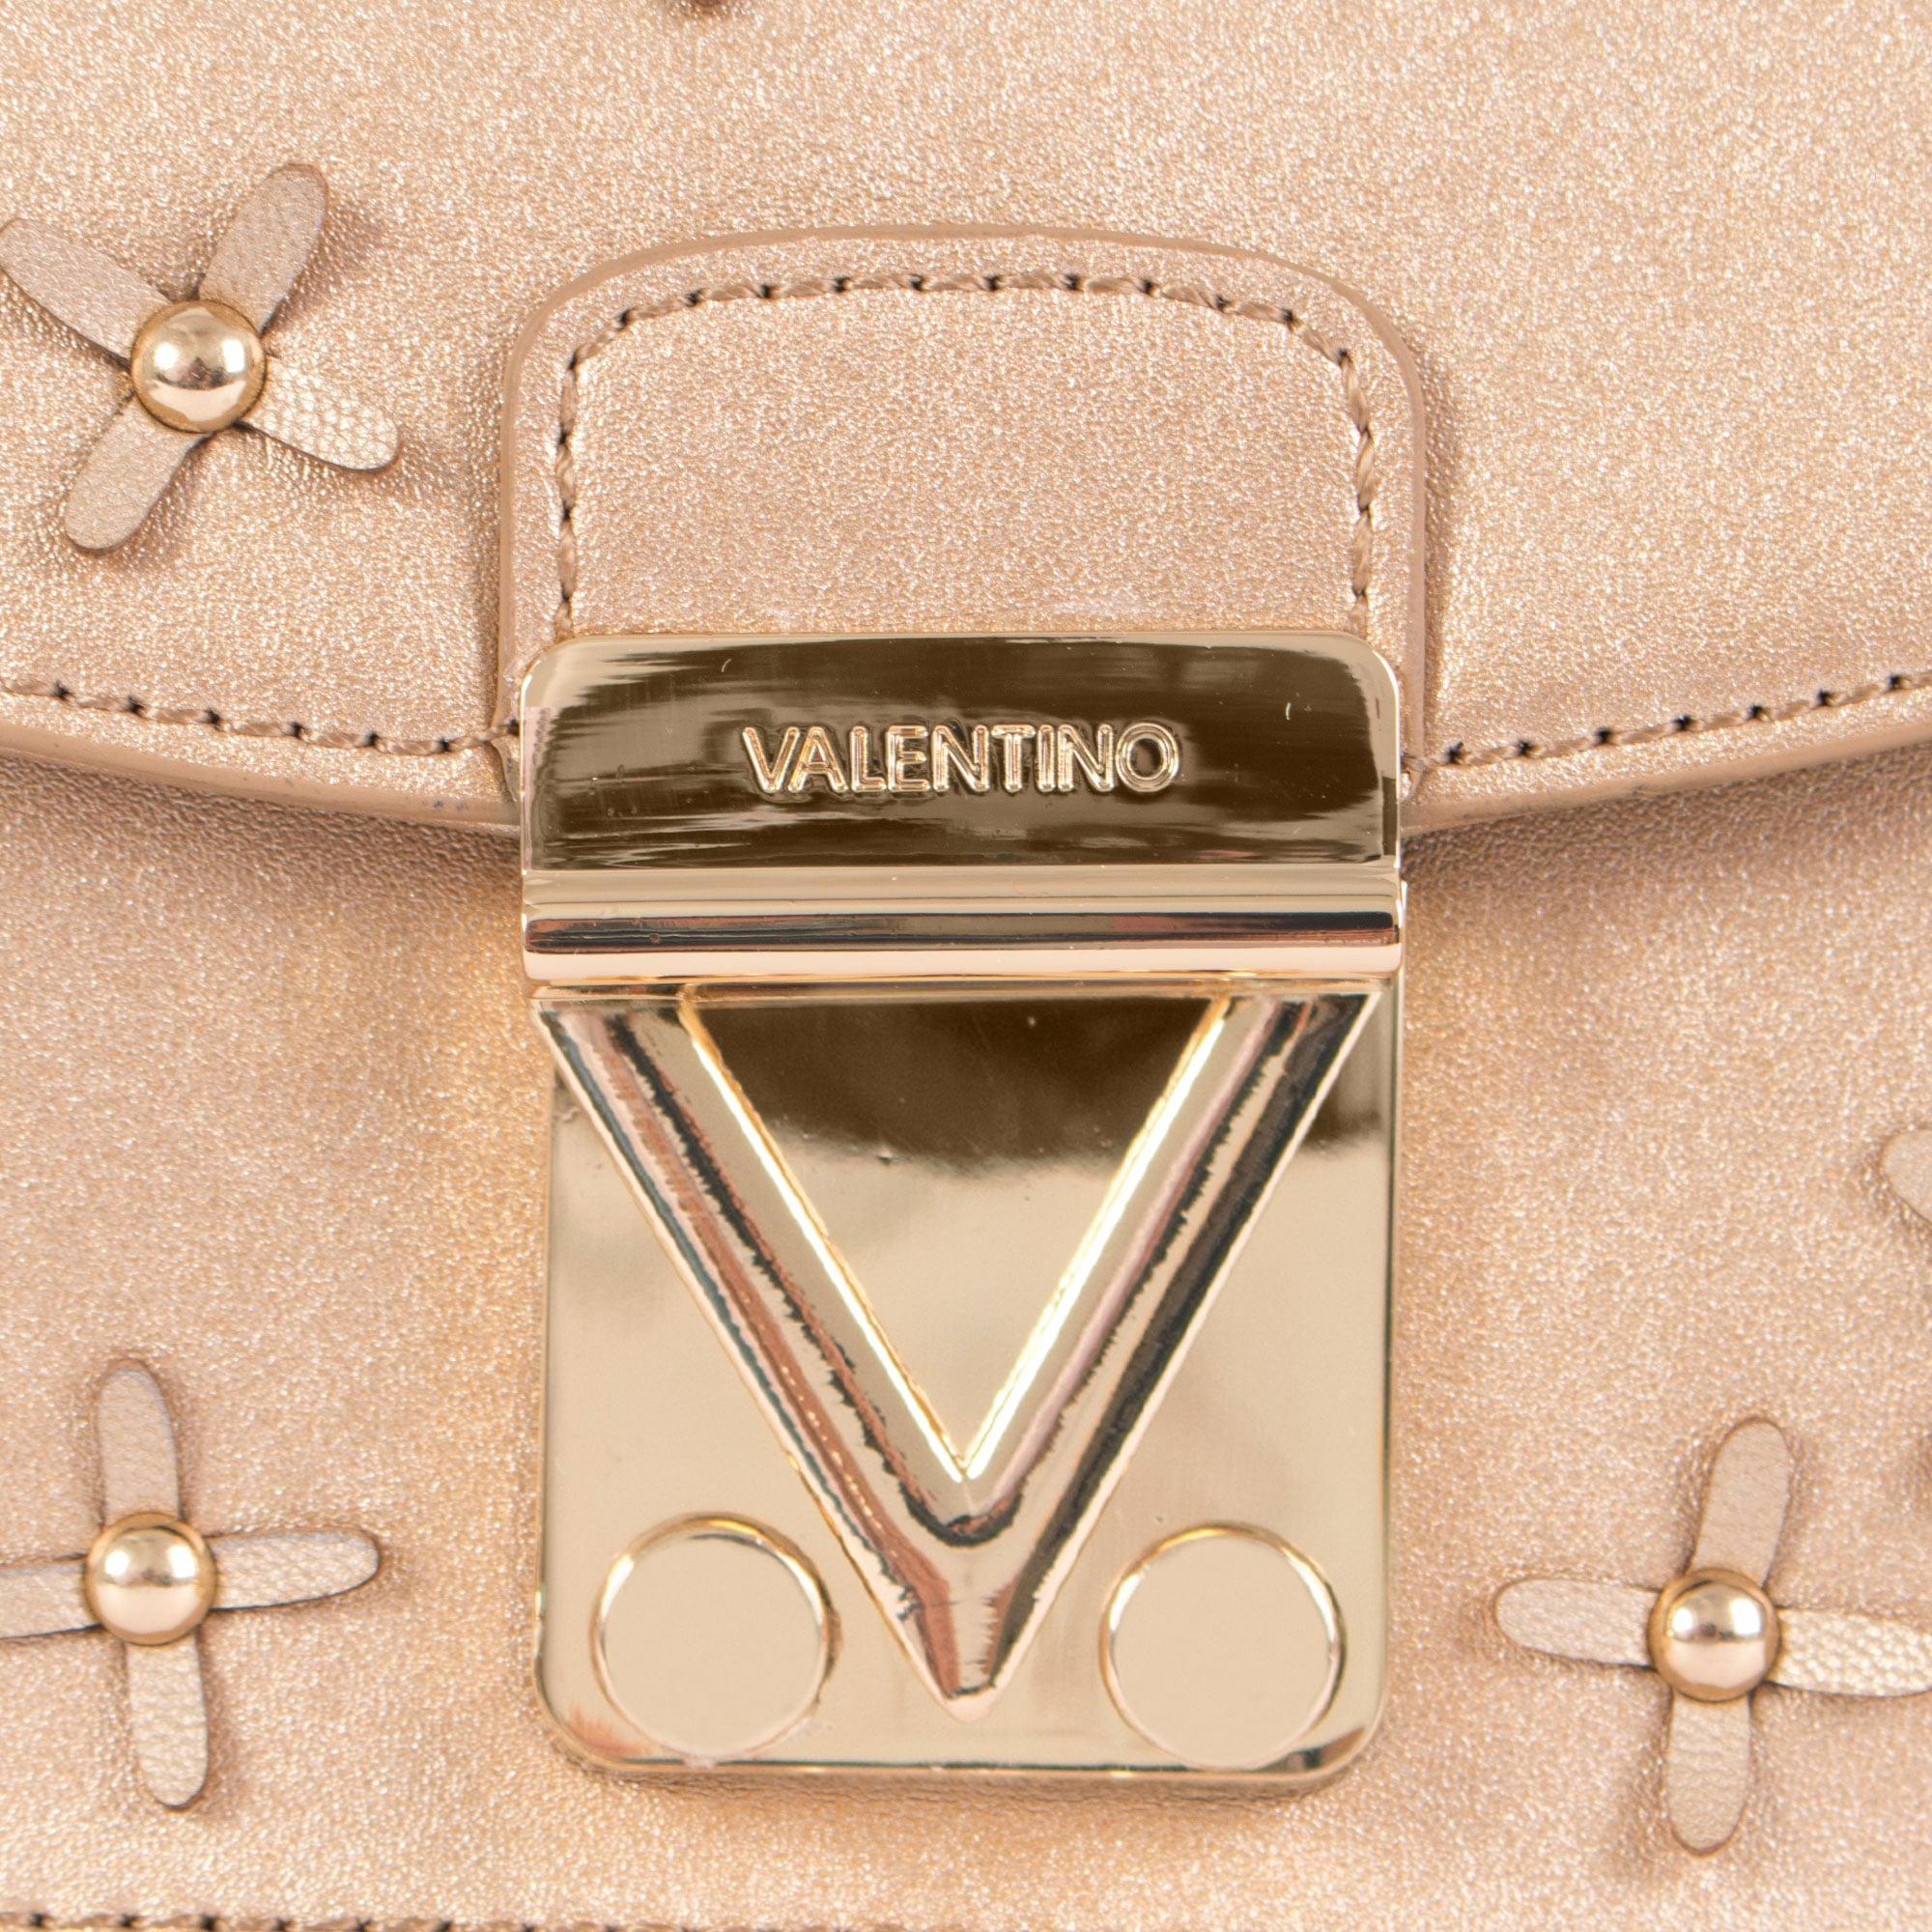 02f6a570fe Valentino Dinghy Flower Detail Clutch in Metallic - Lyst